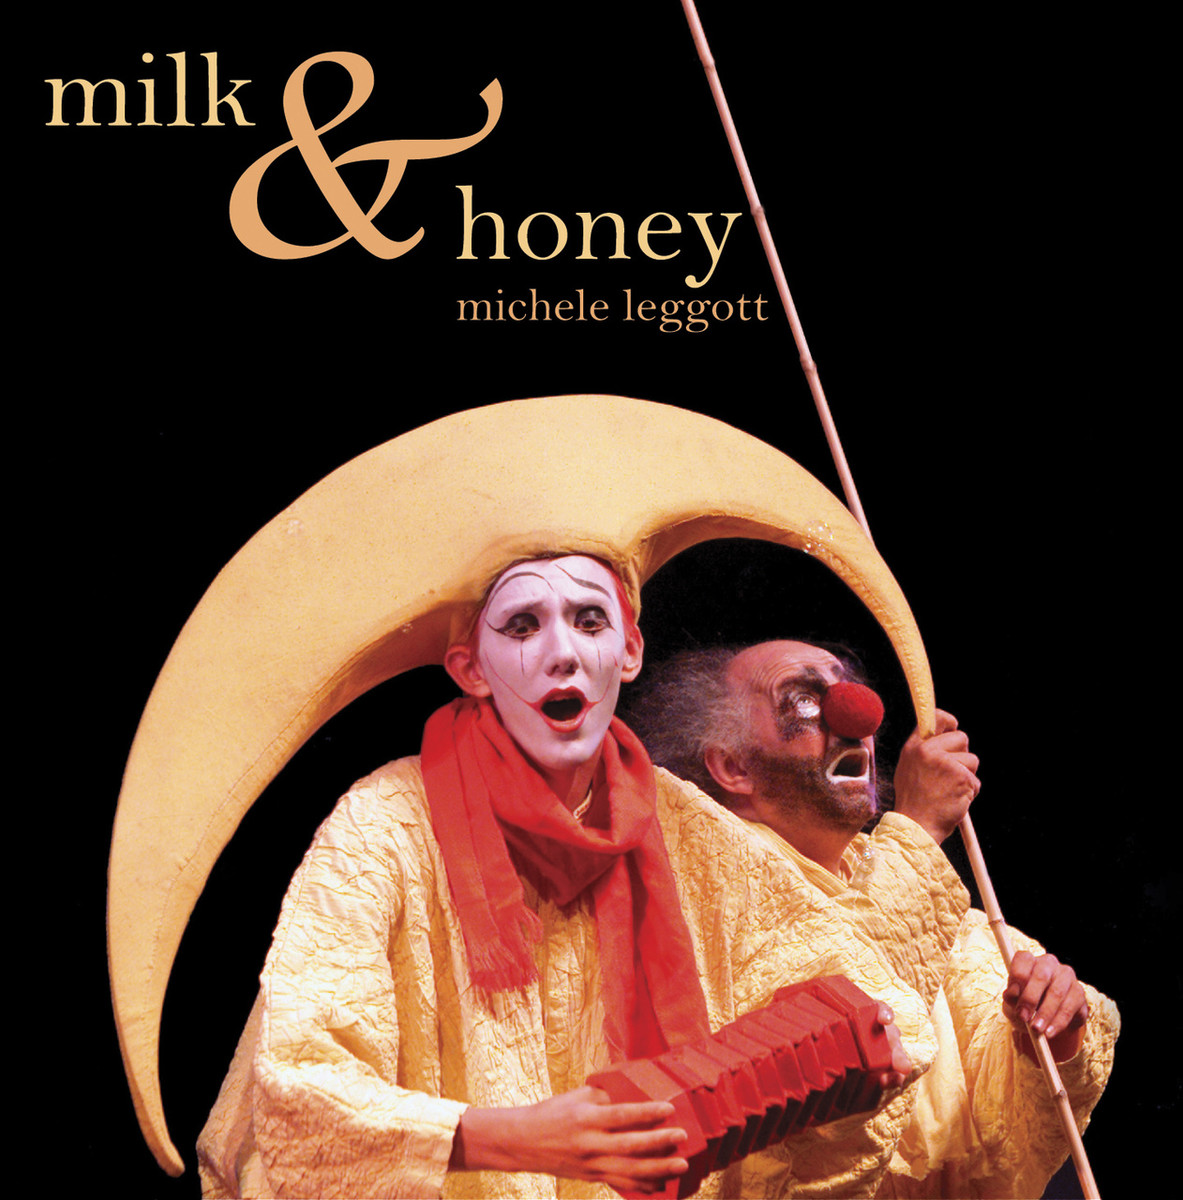 Milk & Honey by Michele Leggott